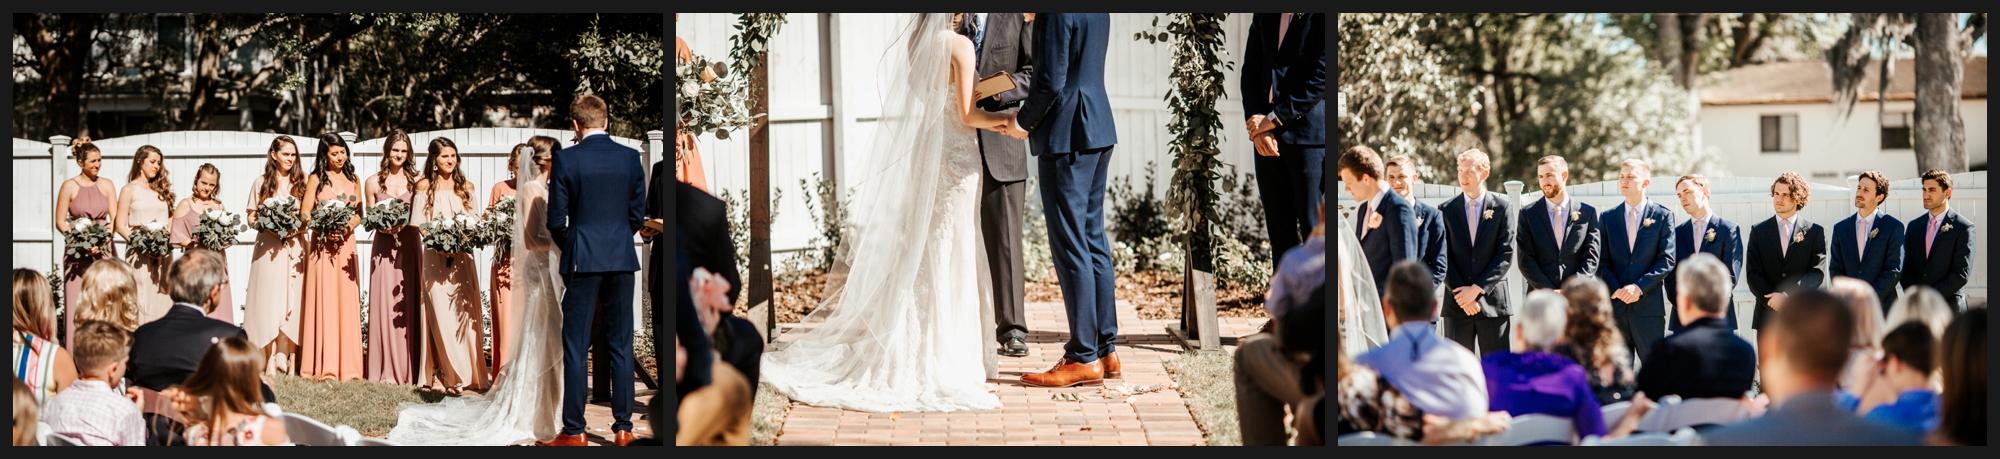 Orlando-Wedding-Photographer-destination-wedding-photographer-florida-wedding-photographer-bohemian-wedding-photographer_1691.jpg